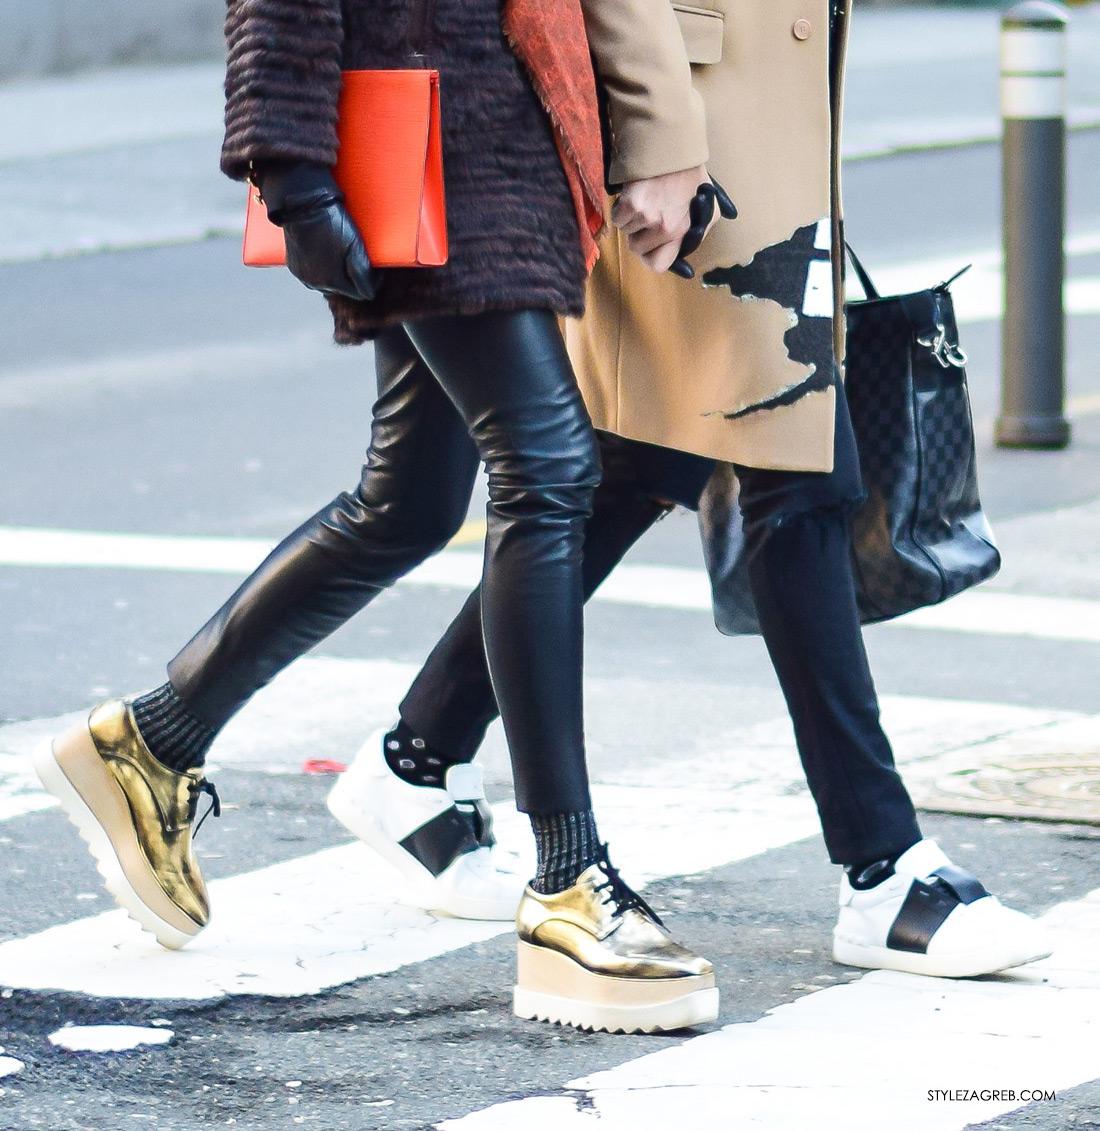 Street style look dizajnerica Marina Lacković i suprug Krešimir, Ideje za dnevni stajling, ulična moda 2016 Zagreb street style Stylezagreb.com